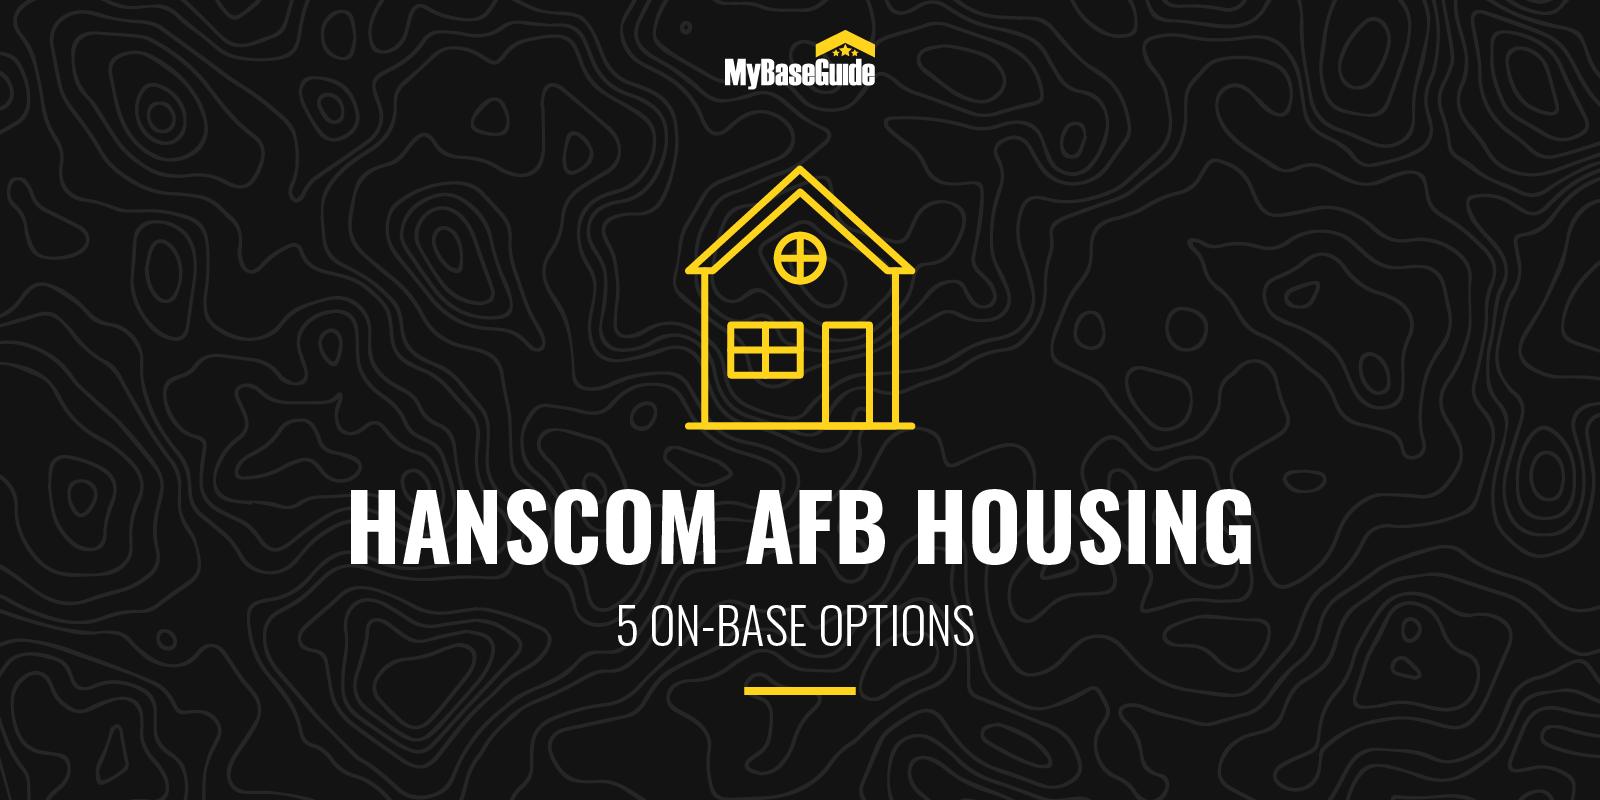 Hanscom AFB Housing: 5 On Base Options